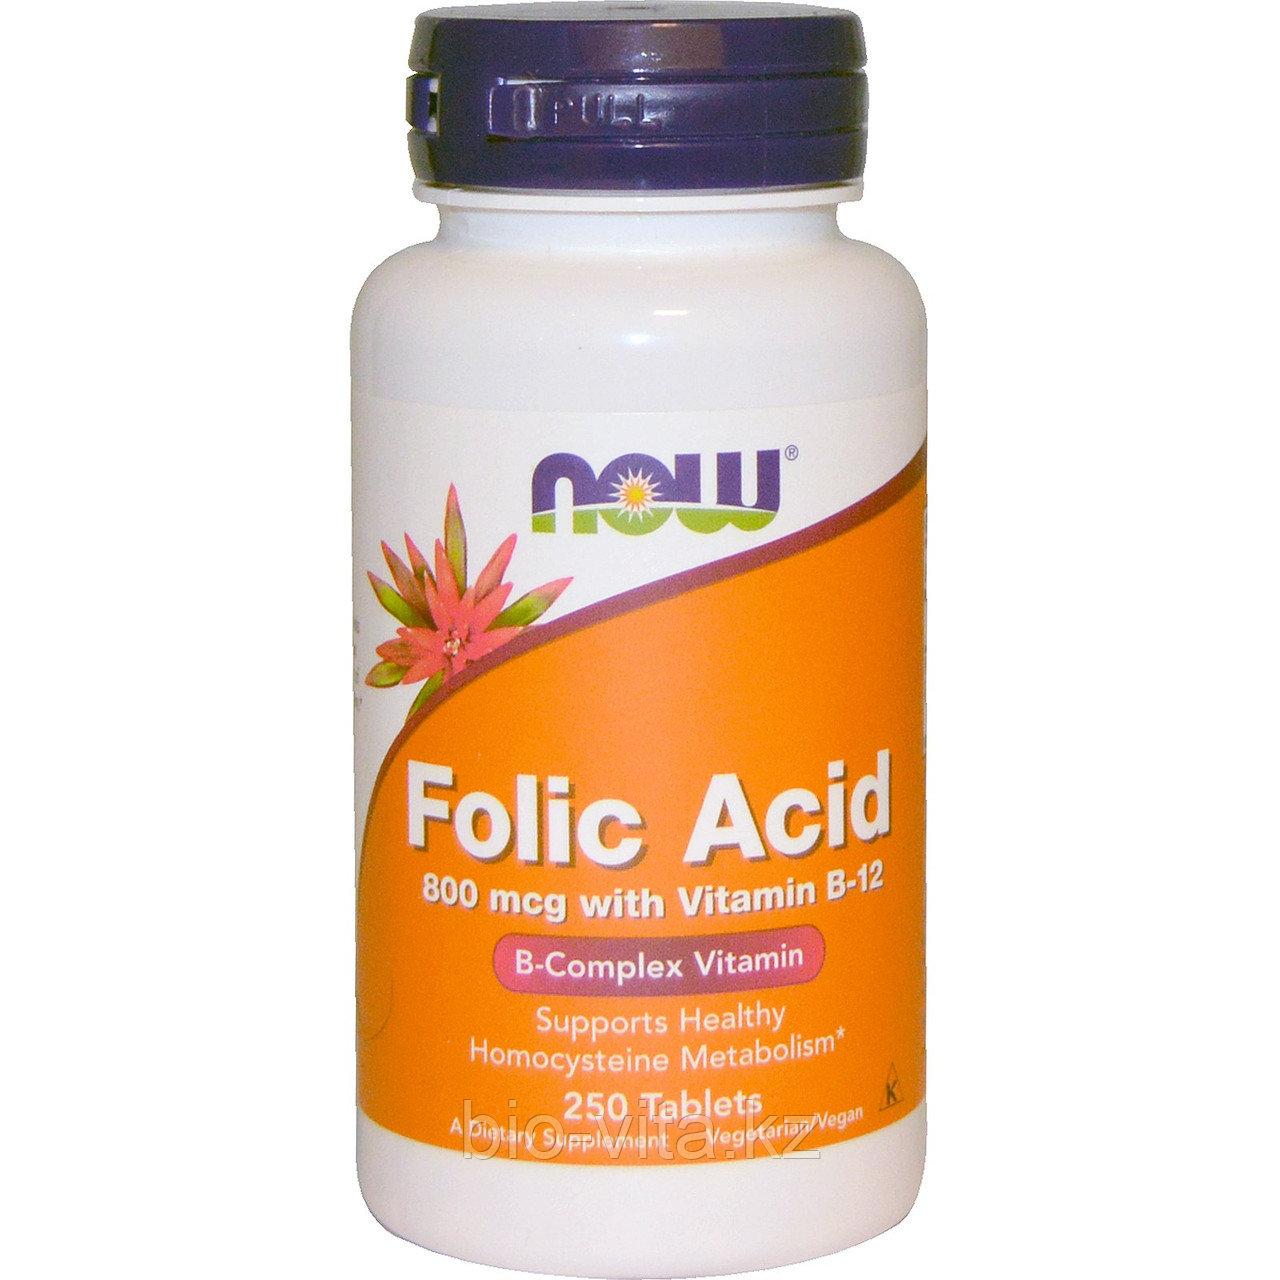 Фолиевая кислота с витамином B12, 800 мкг, 250 таблеток. Now Foods